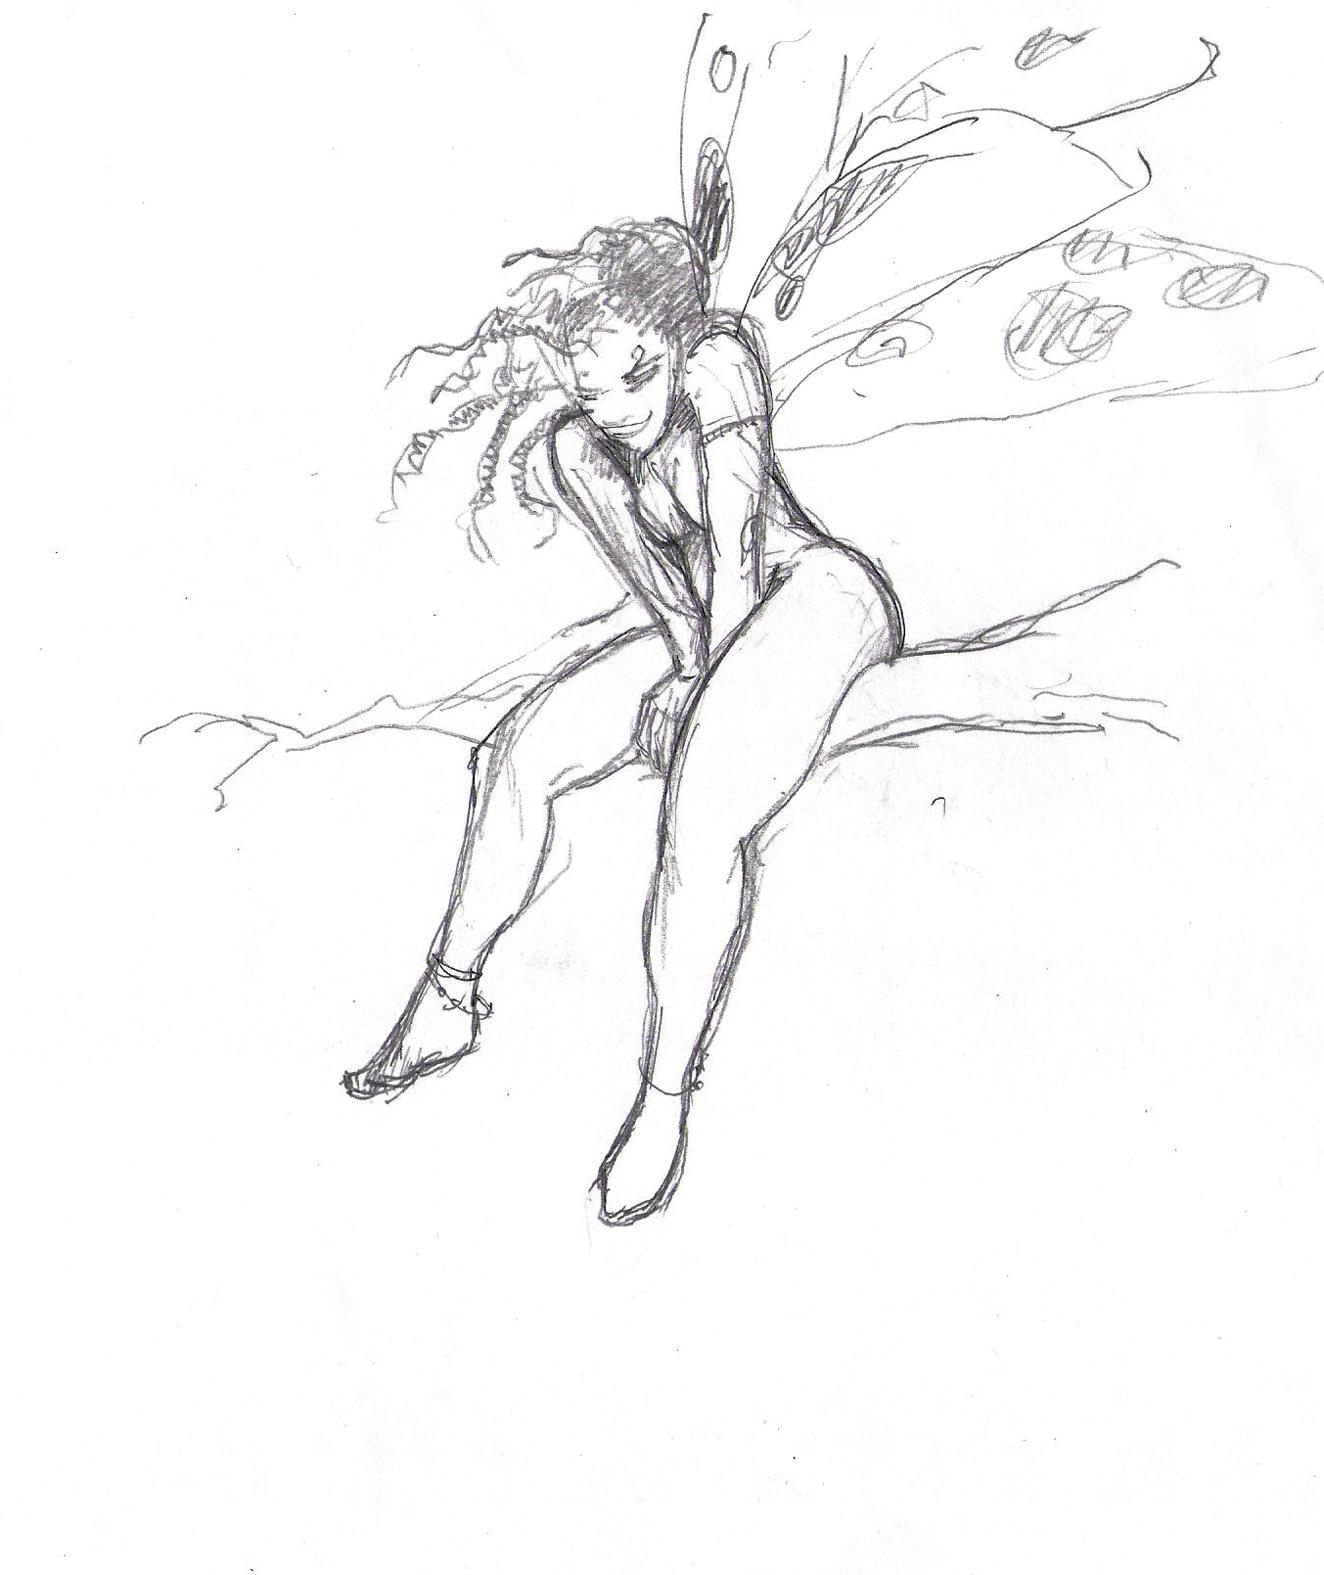 Bur 'K Tau - Schets - In the tree